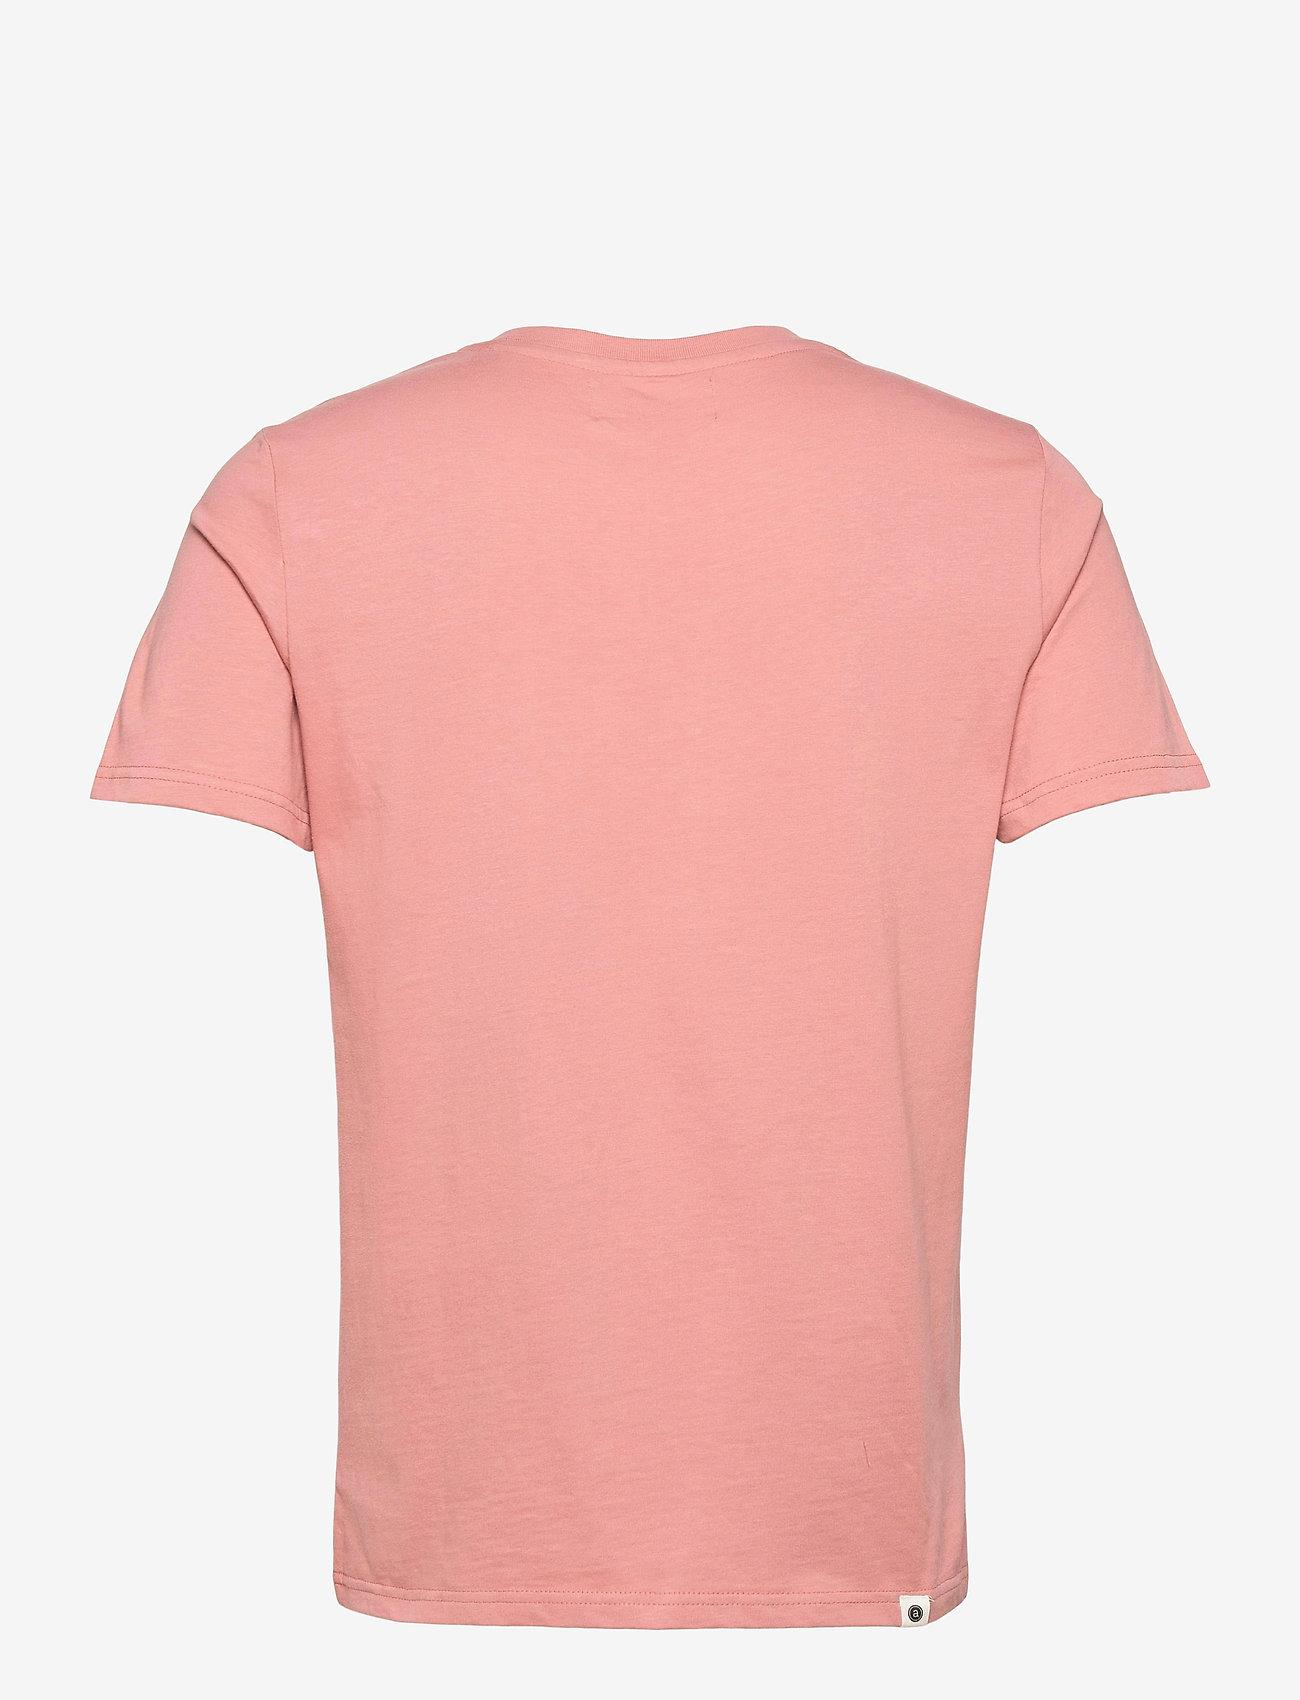 Anerkjendt - AKROD T-SHIRT - t-shirts - old rose - 1